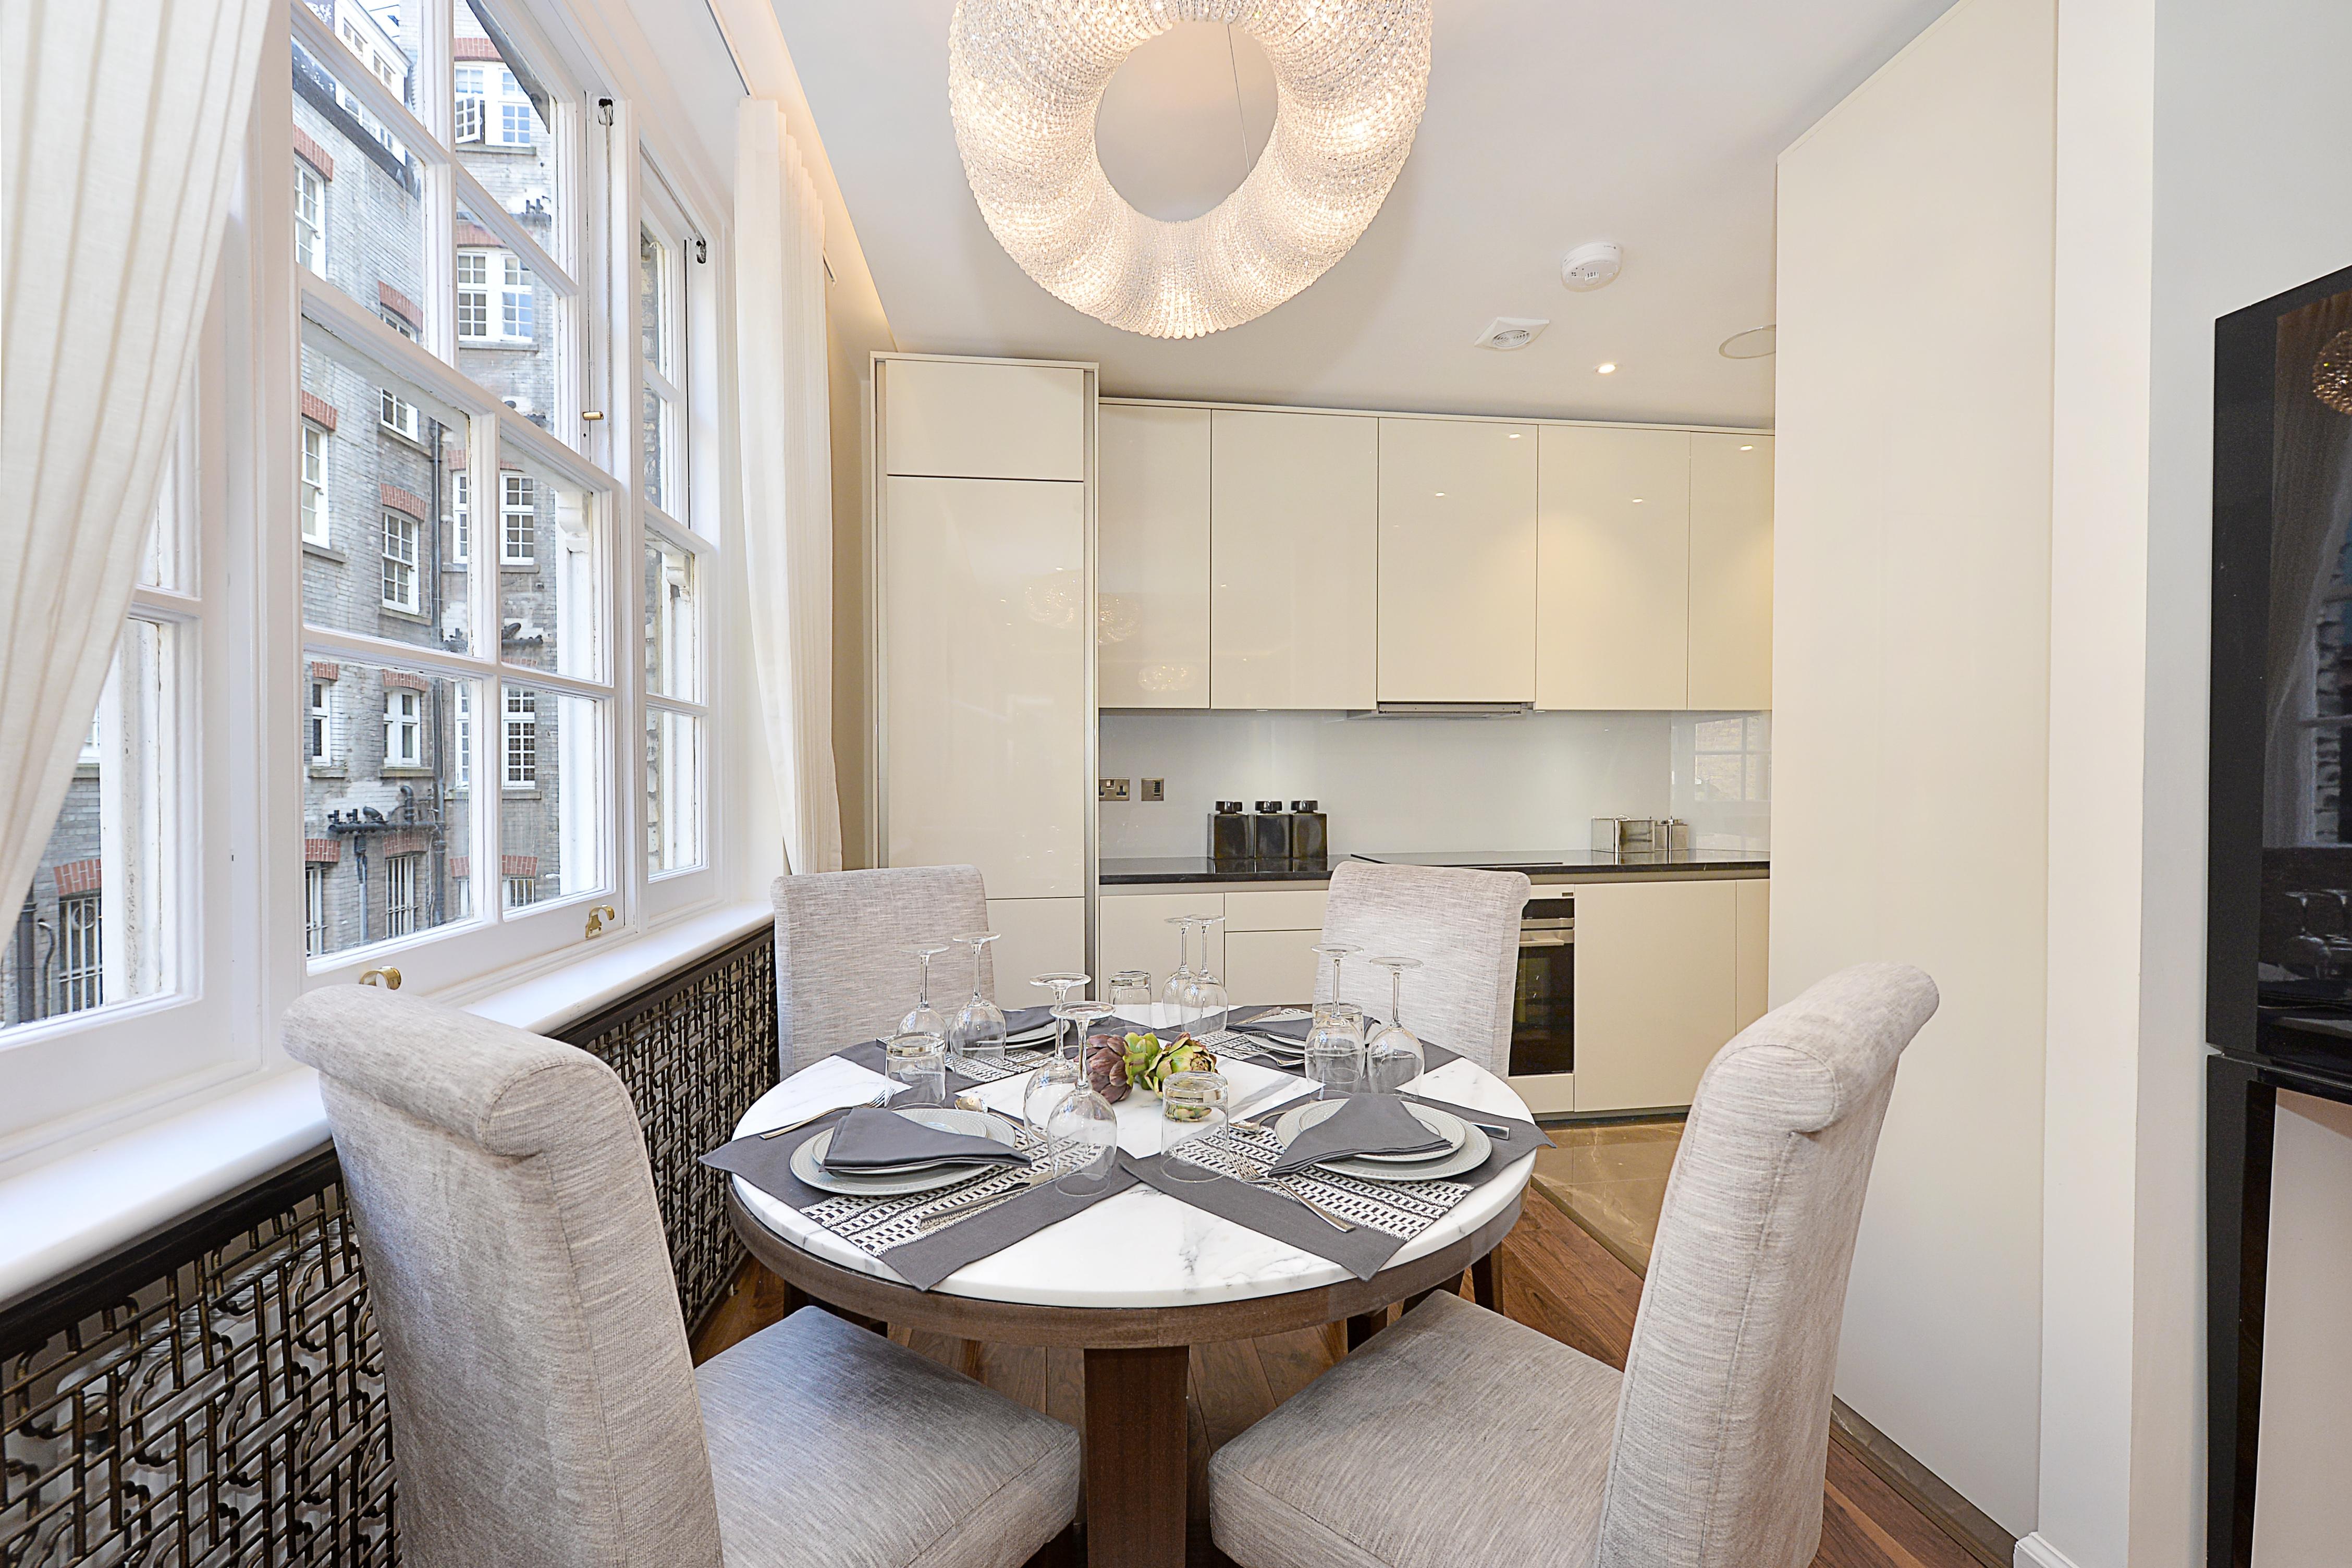 Montagu Mansions,Breakfast rooms